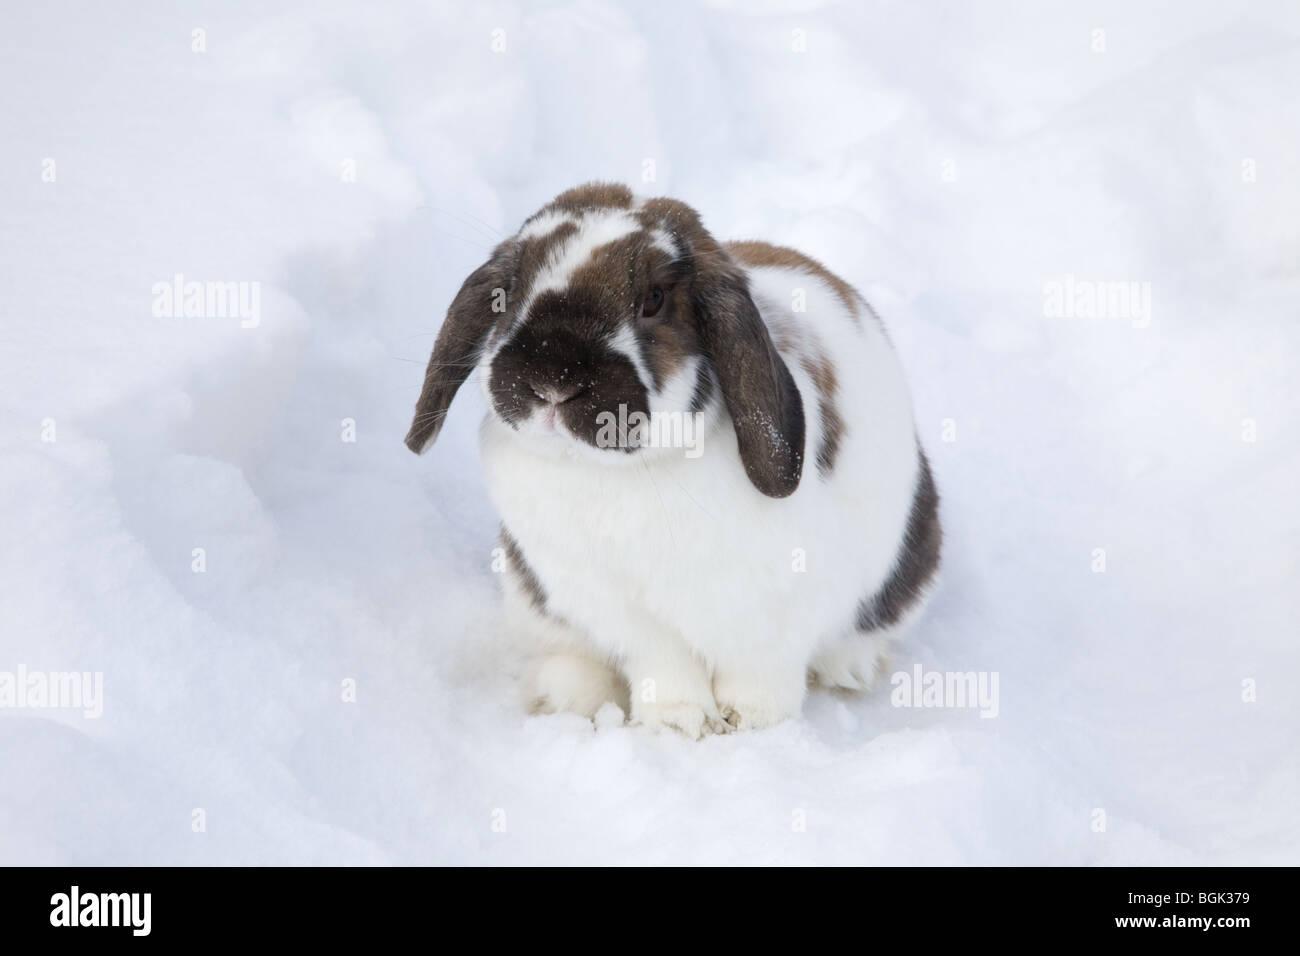 Holland Lop pet dwarf rabbit outdoors in backyard  in winter - Stock Image